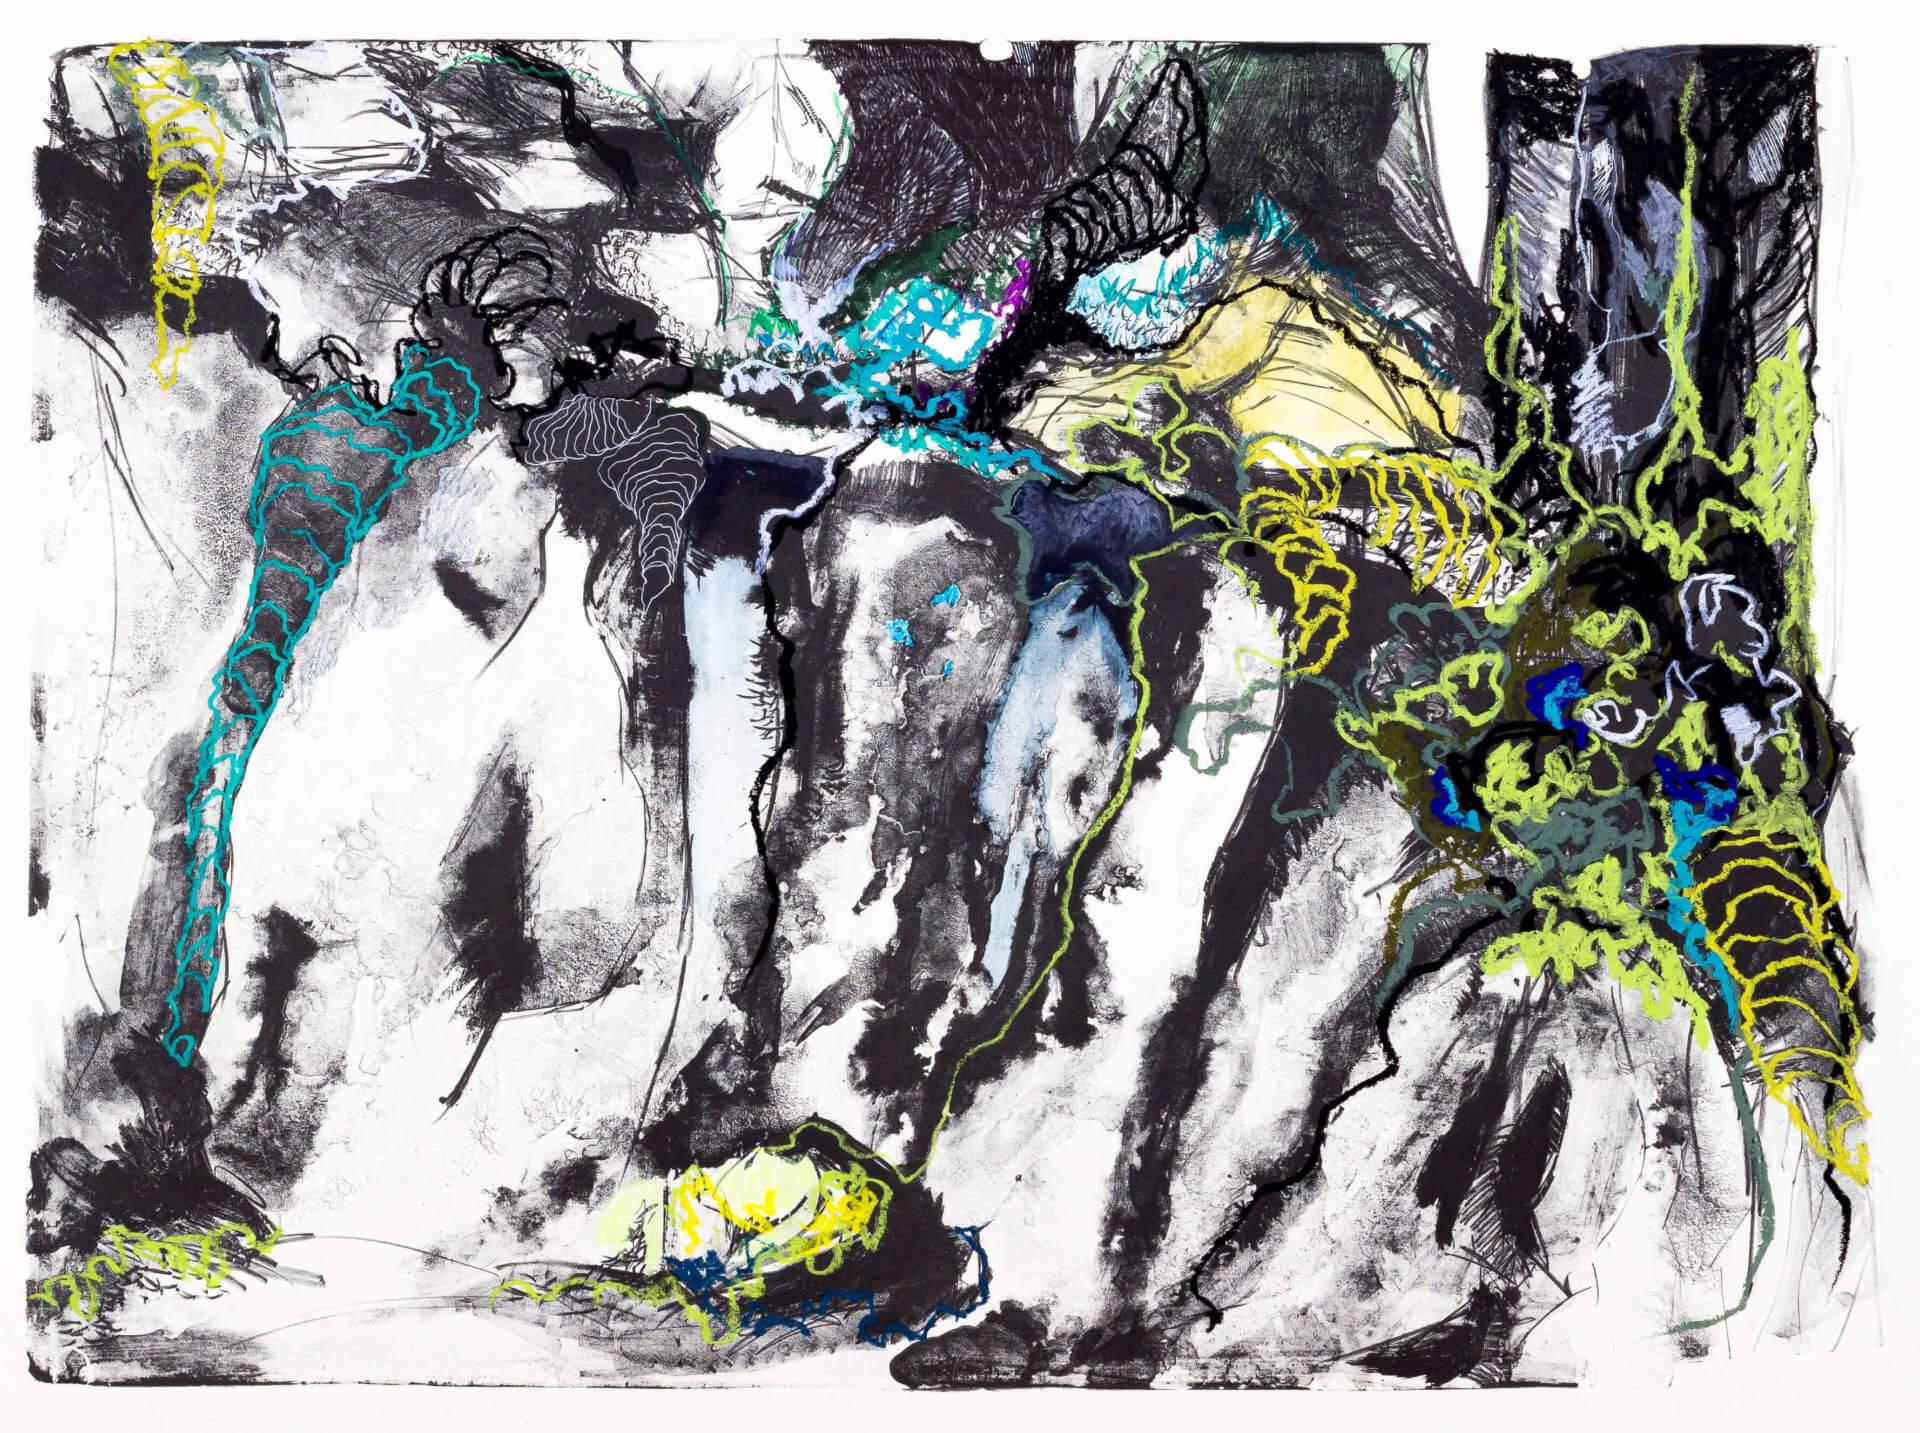 Katharina Albers, Wald (F_B)(B), 2016, Lithographie handkoloriert (Ölkreide, Graphit, Aquarellfarbe, Fineliner, Gelstift, Tusche), Unikat, 70×100 cm